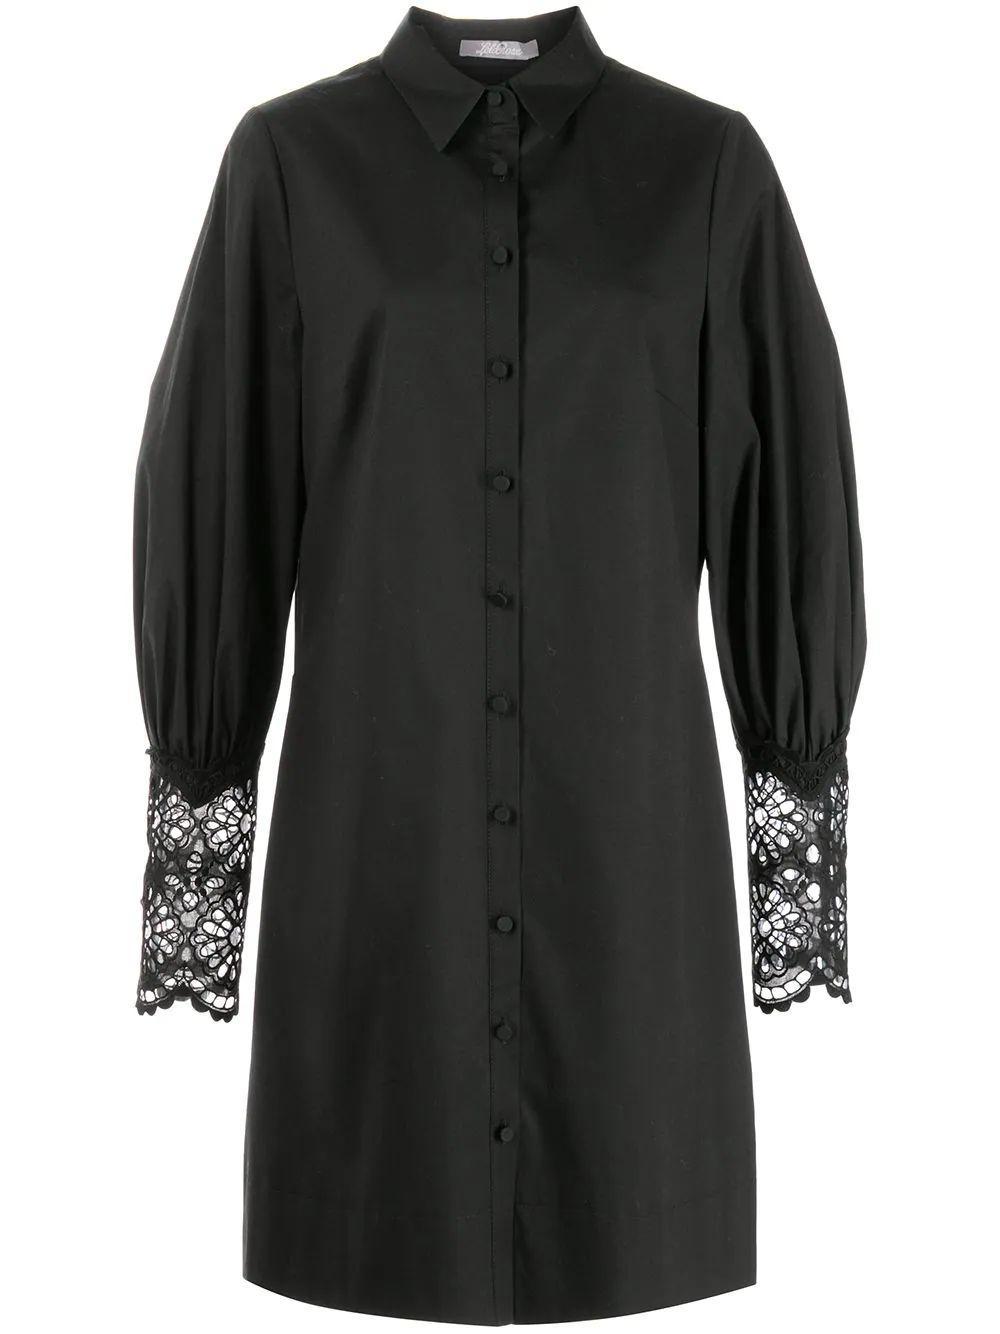 Lace Cuff Shirt Dress Item # S219662